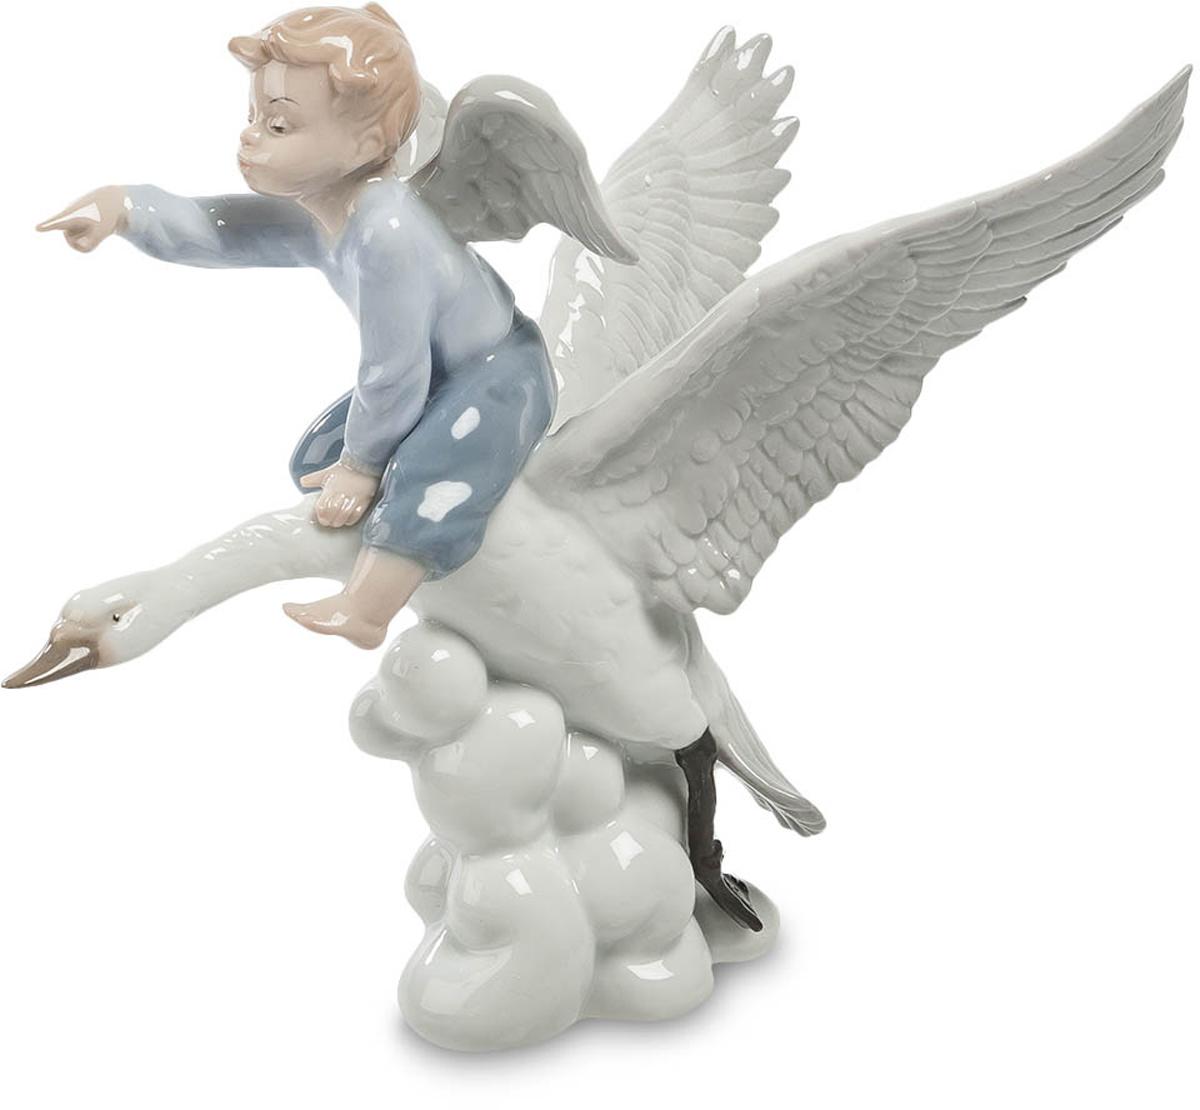 Фигурка Pavone Ангел. JP-22/ 210850/1W GOLD IVORYФигурка Ангела высотой 19 см.Верхом на птице рассекает облака повелитель небес!